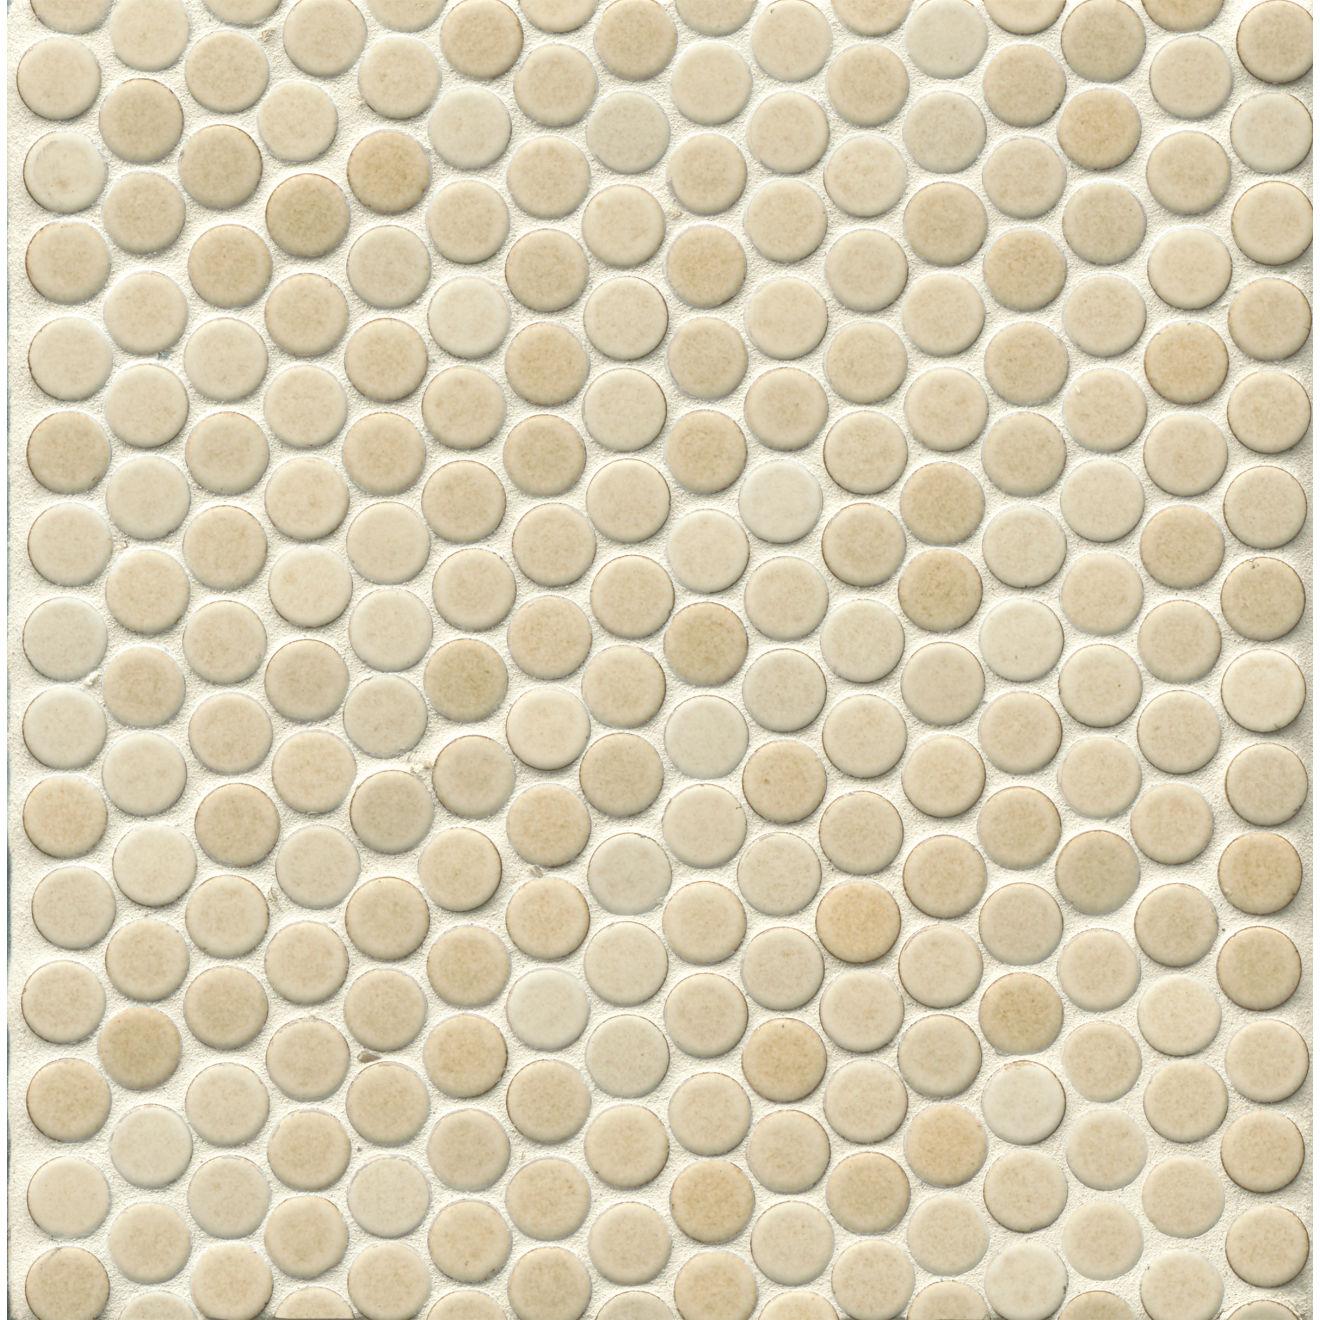 "360 3/4"" x 3/4"" Floor & Wall Mosaic in Beige"